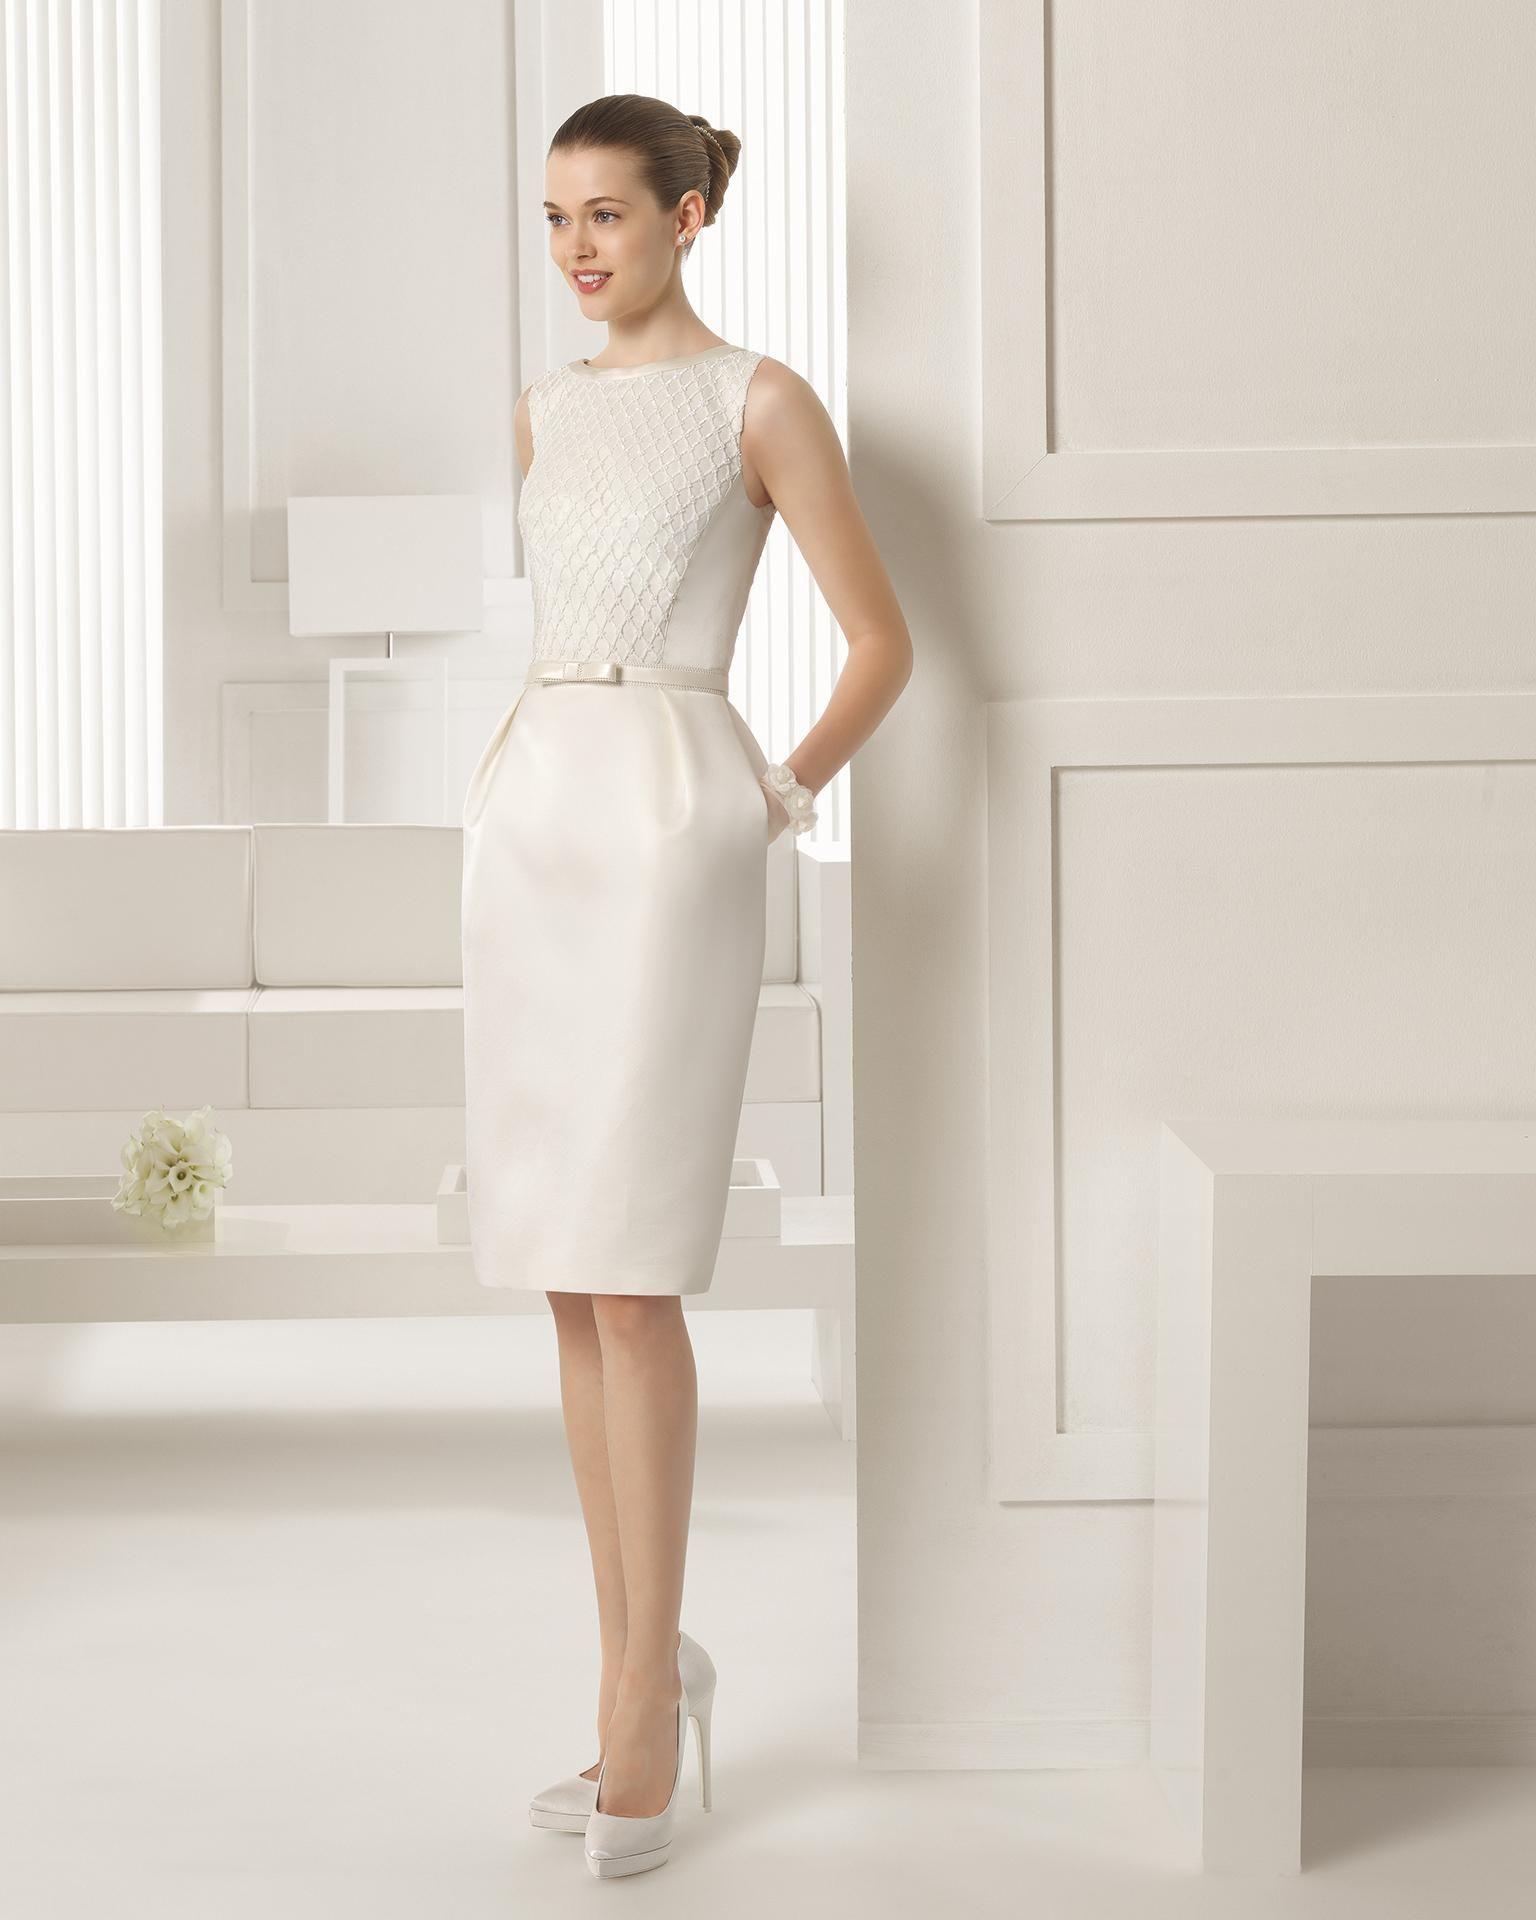 Cheap 2015 Wedding Dress Jewel Button Back Sleeveless Floor Length Or Mini Detachable Sash Sequin Satin Gown Dress FWY-0275, $166.5   DHgate.com